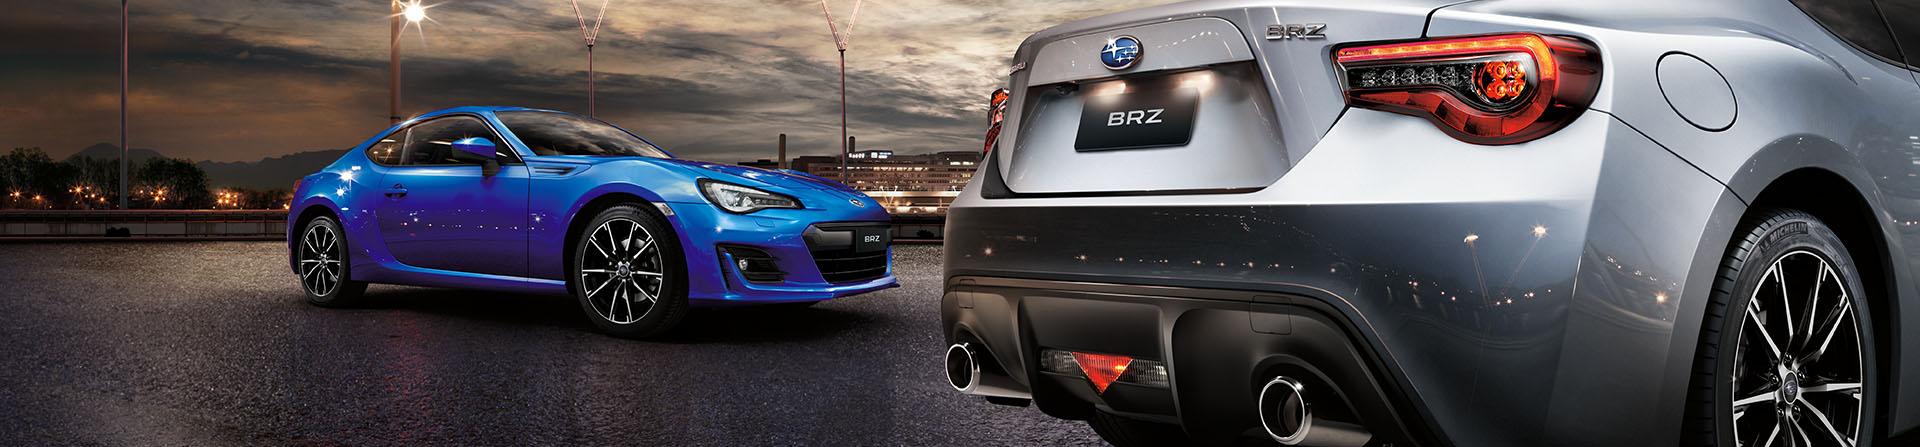 Subaru BRZ Image 1